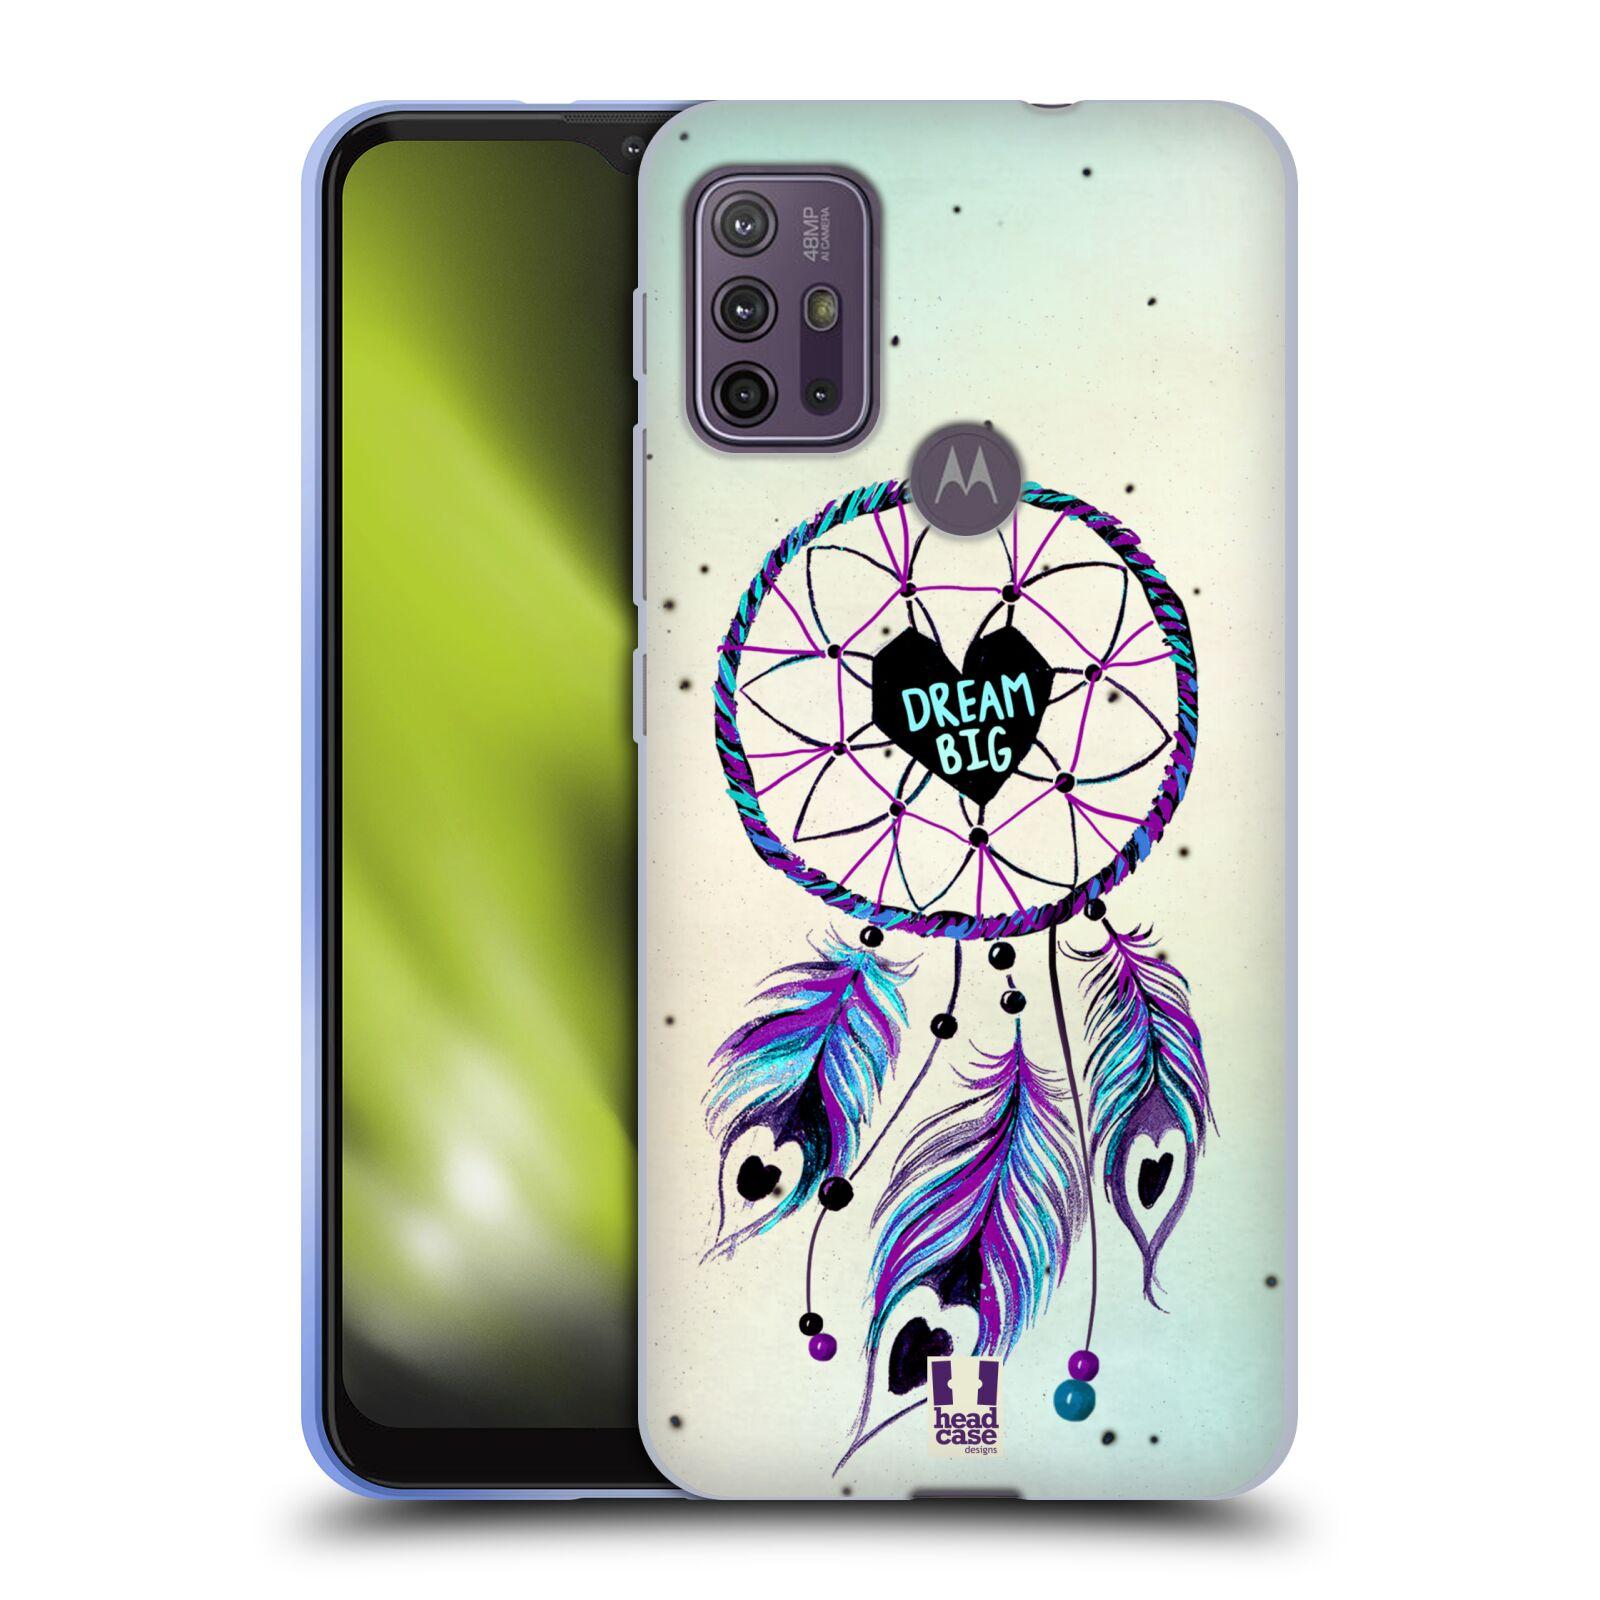 Silikonové pouzdro na mobil Motorola Moto G10 / G30 - Head Case - Lapač Assorted Dream Big Srdce